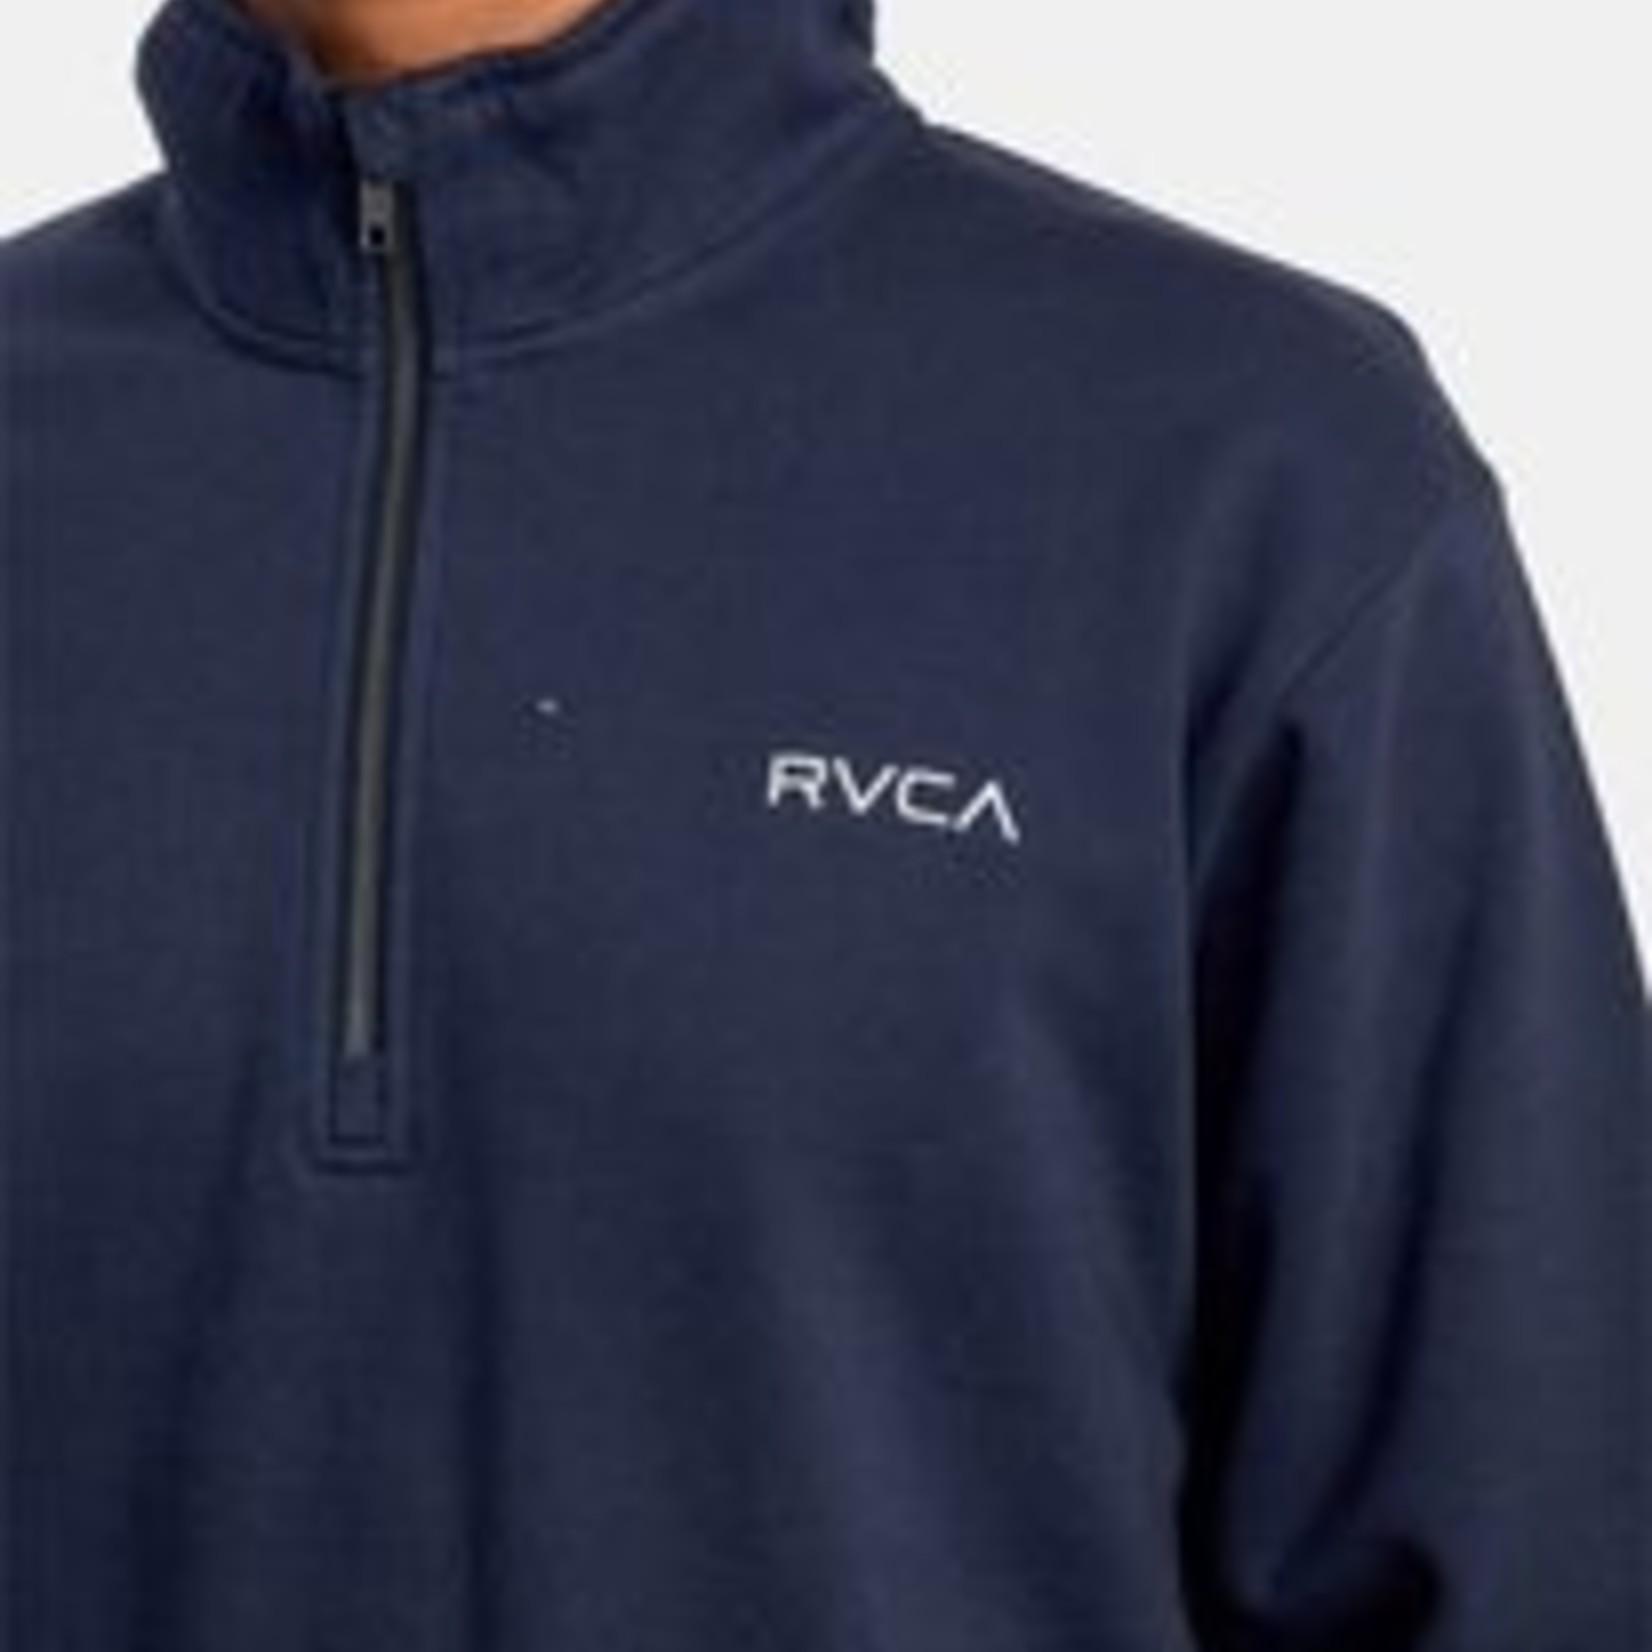 RVCA RVCA Keats 1/2 Zip Mock